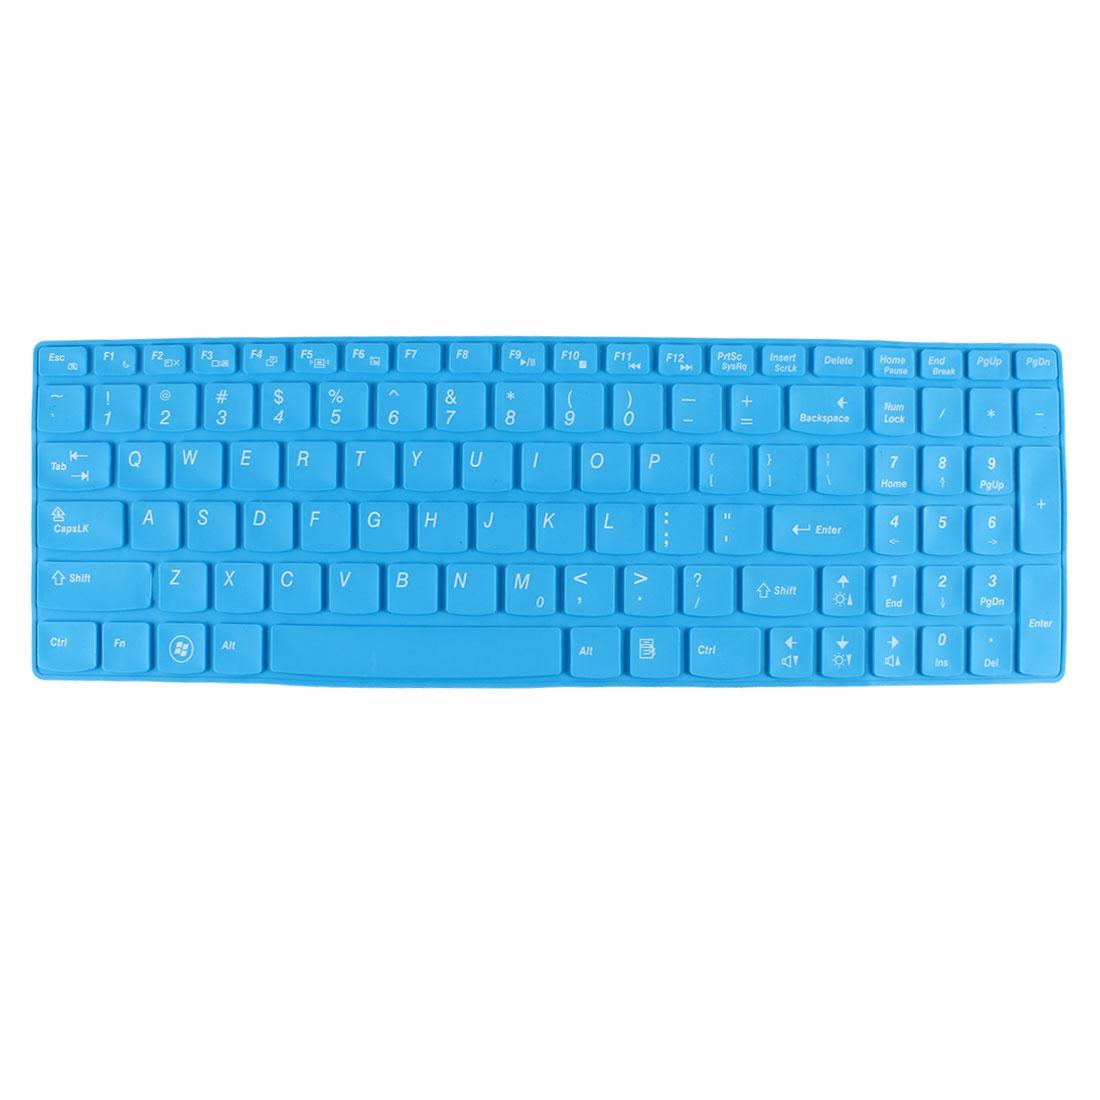 Unique Bargains Laptop Keyboard Protector Film Sky Blue for Lenovo Ideapad Z560/B570/B575/Y570D